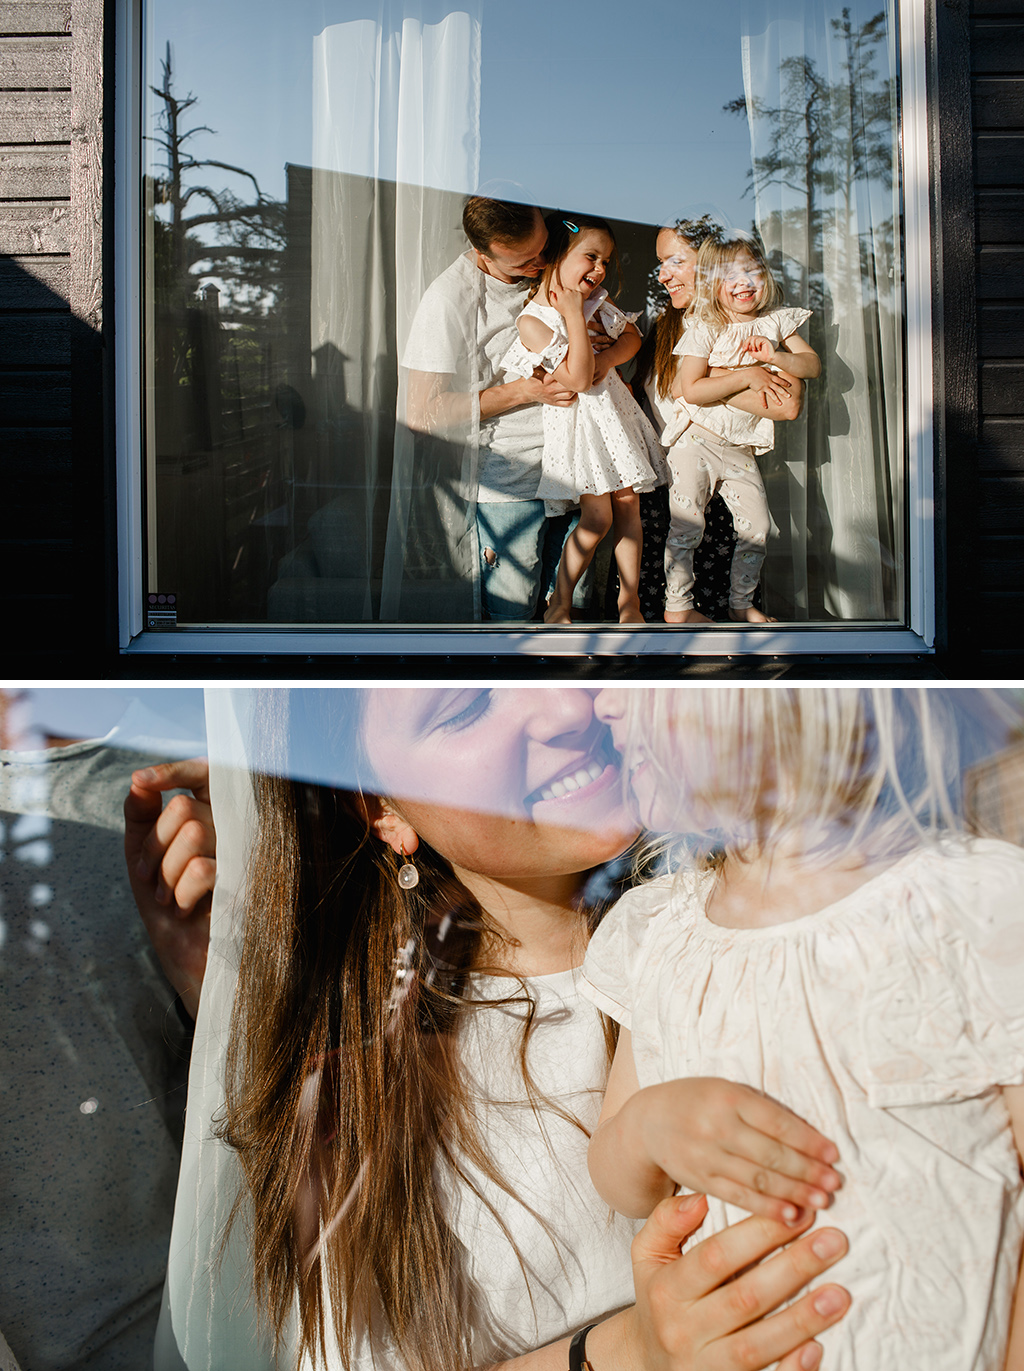 Lifestyle_hemma-hos-fotografering_Familjefotograf_Stockholm_10.jpg